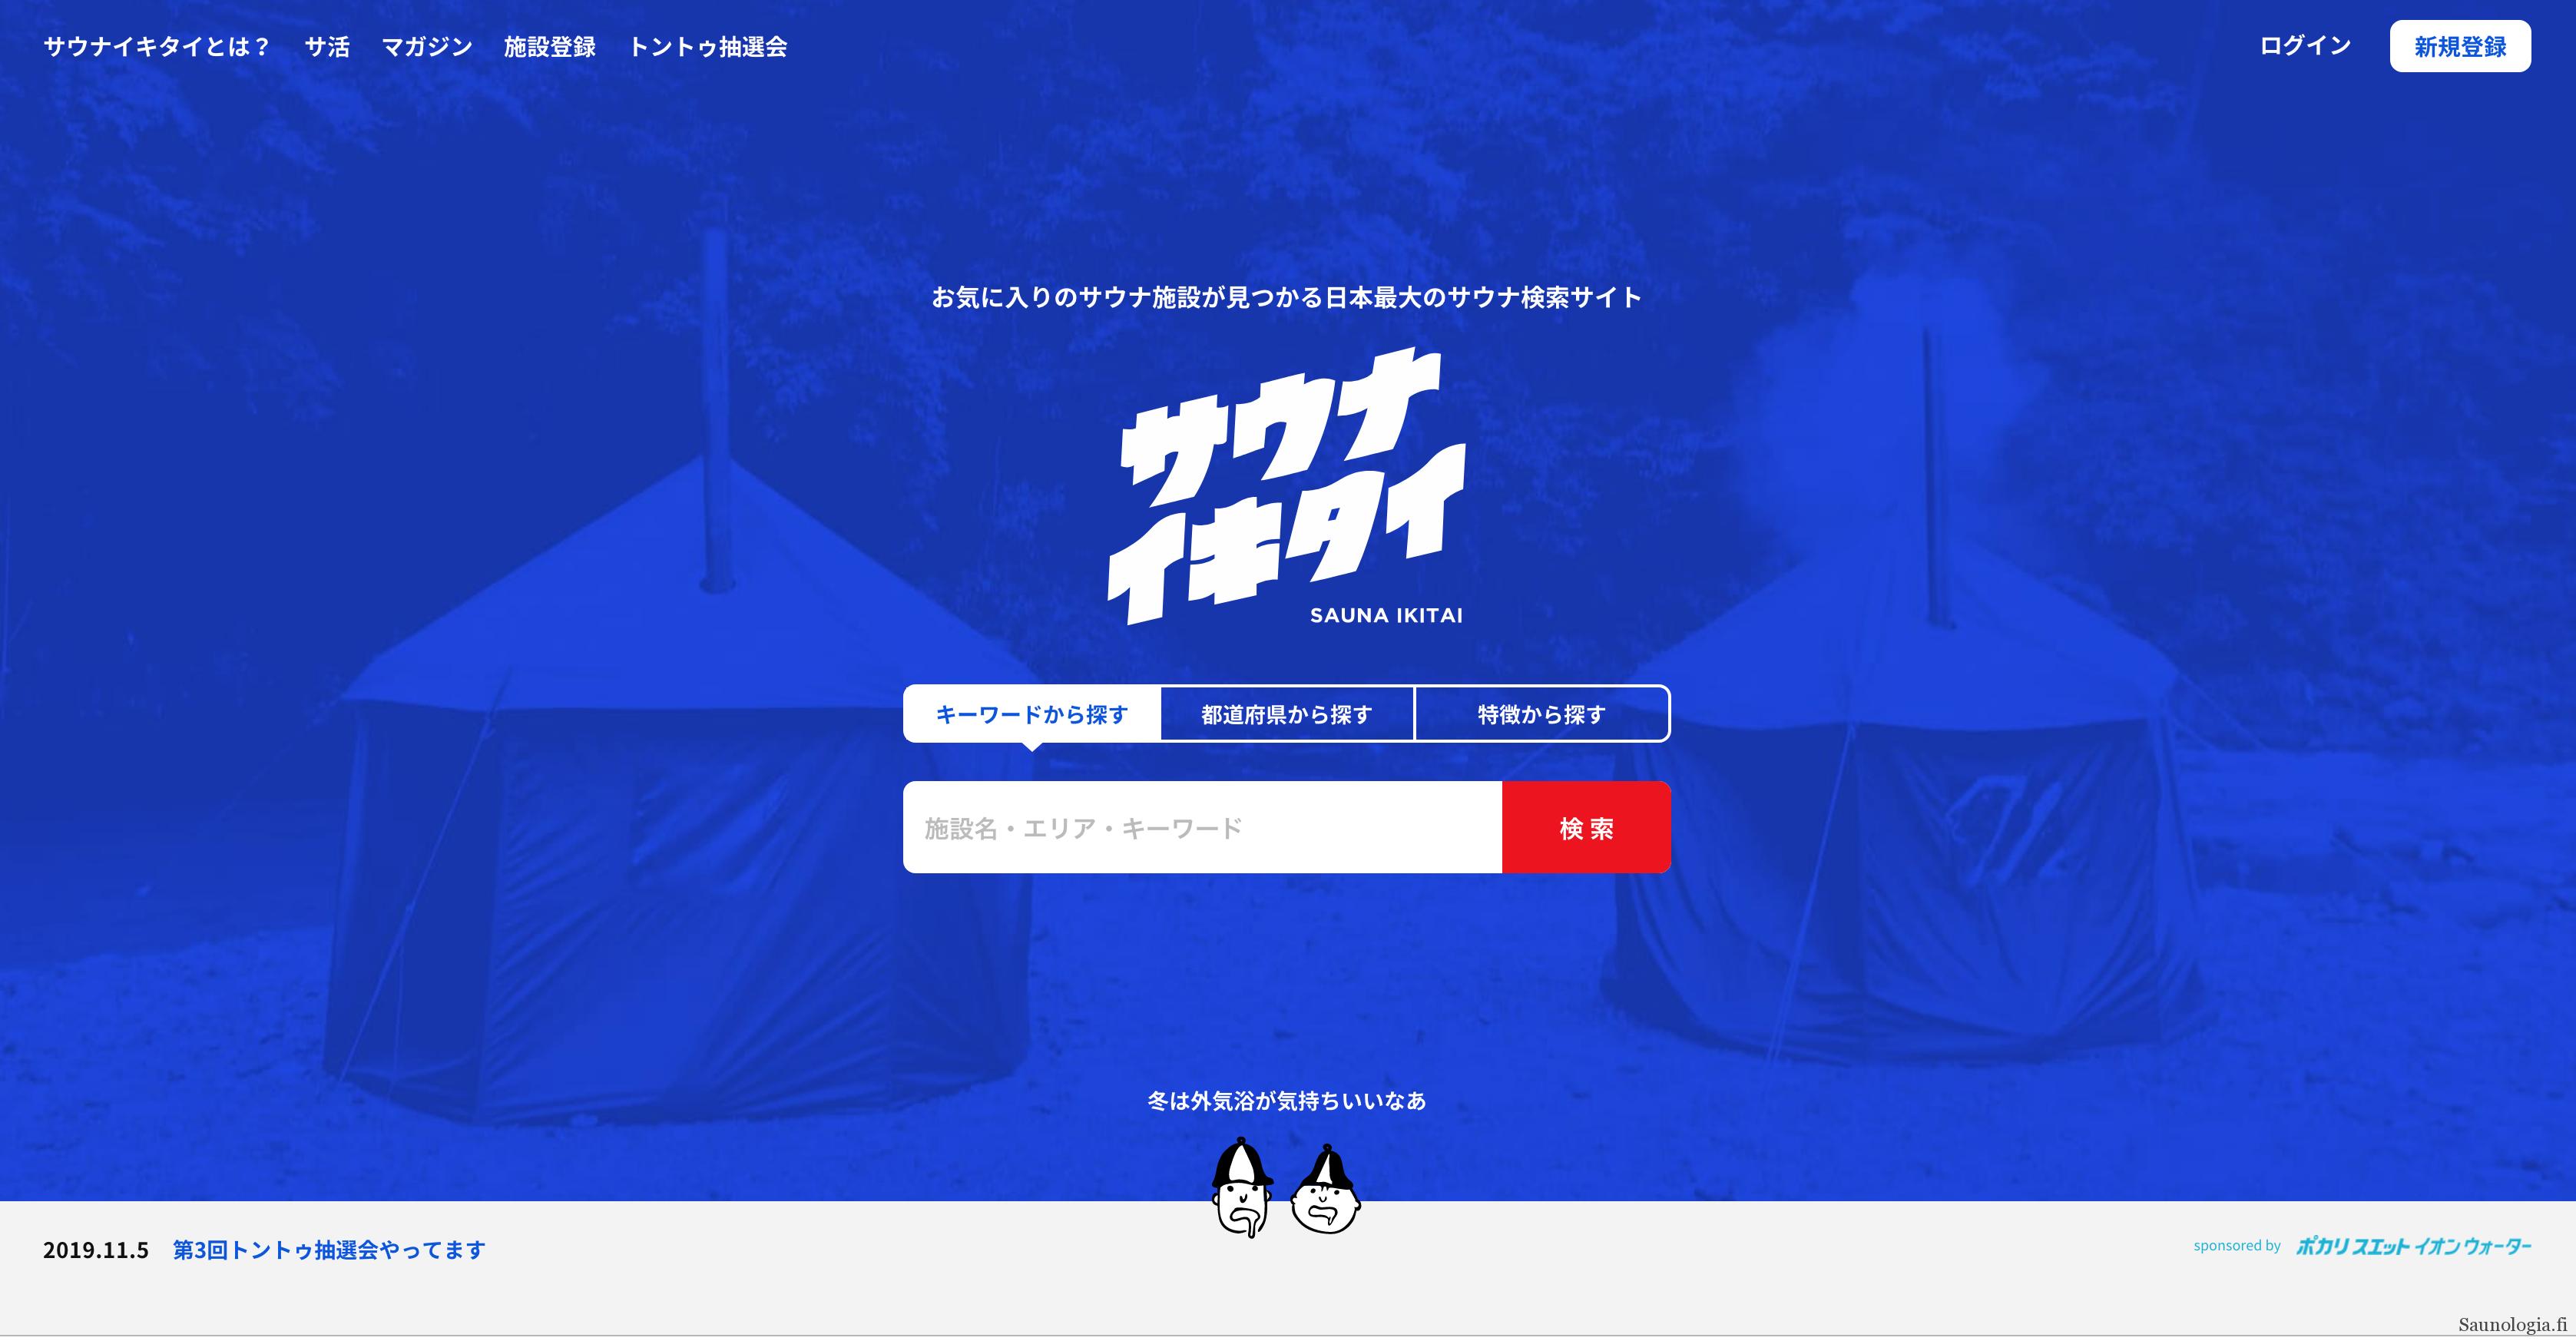 Sauna Ikitai – Japanin digitaalinen saunaseura